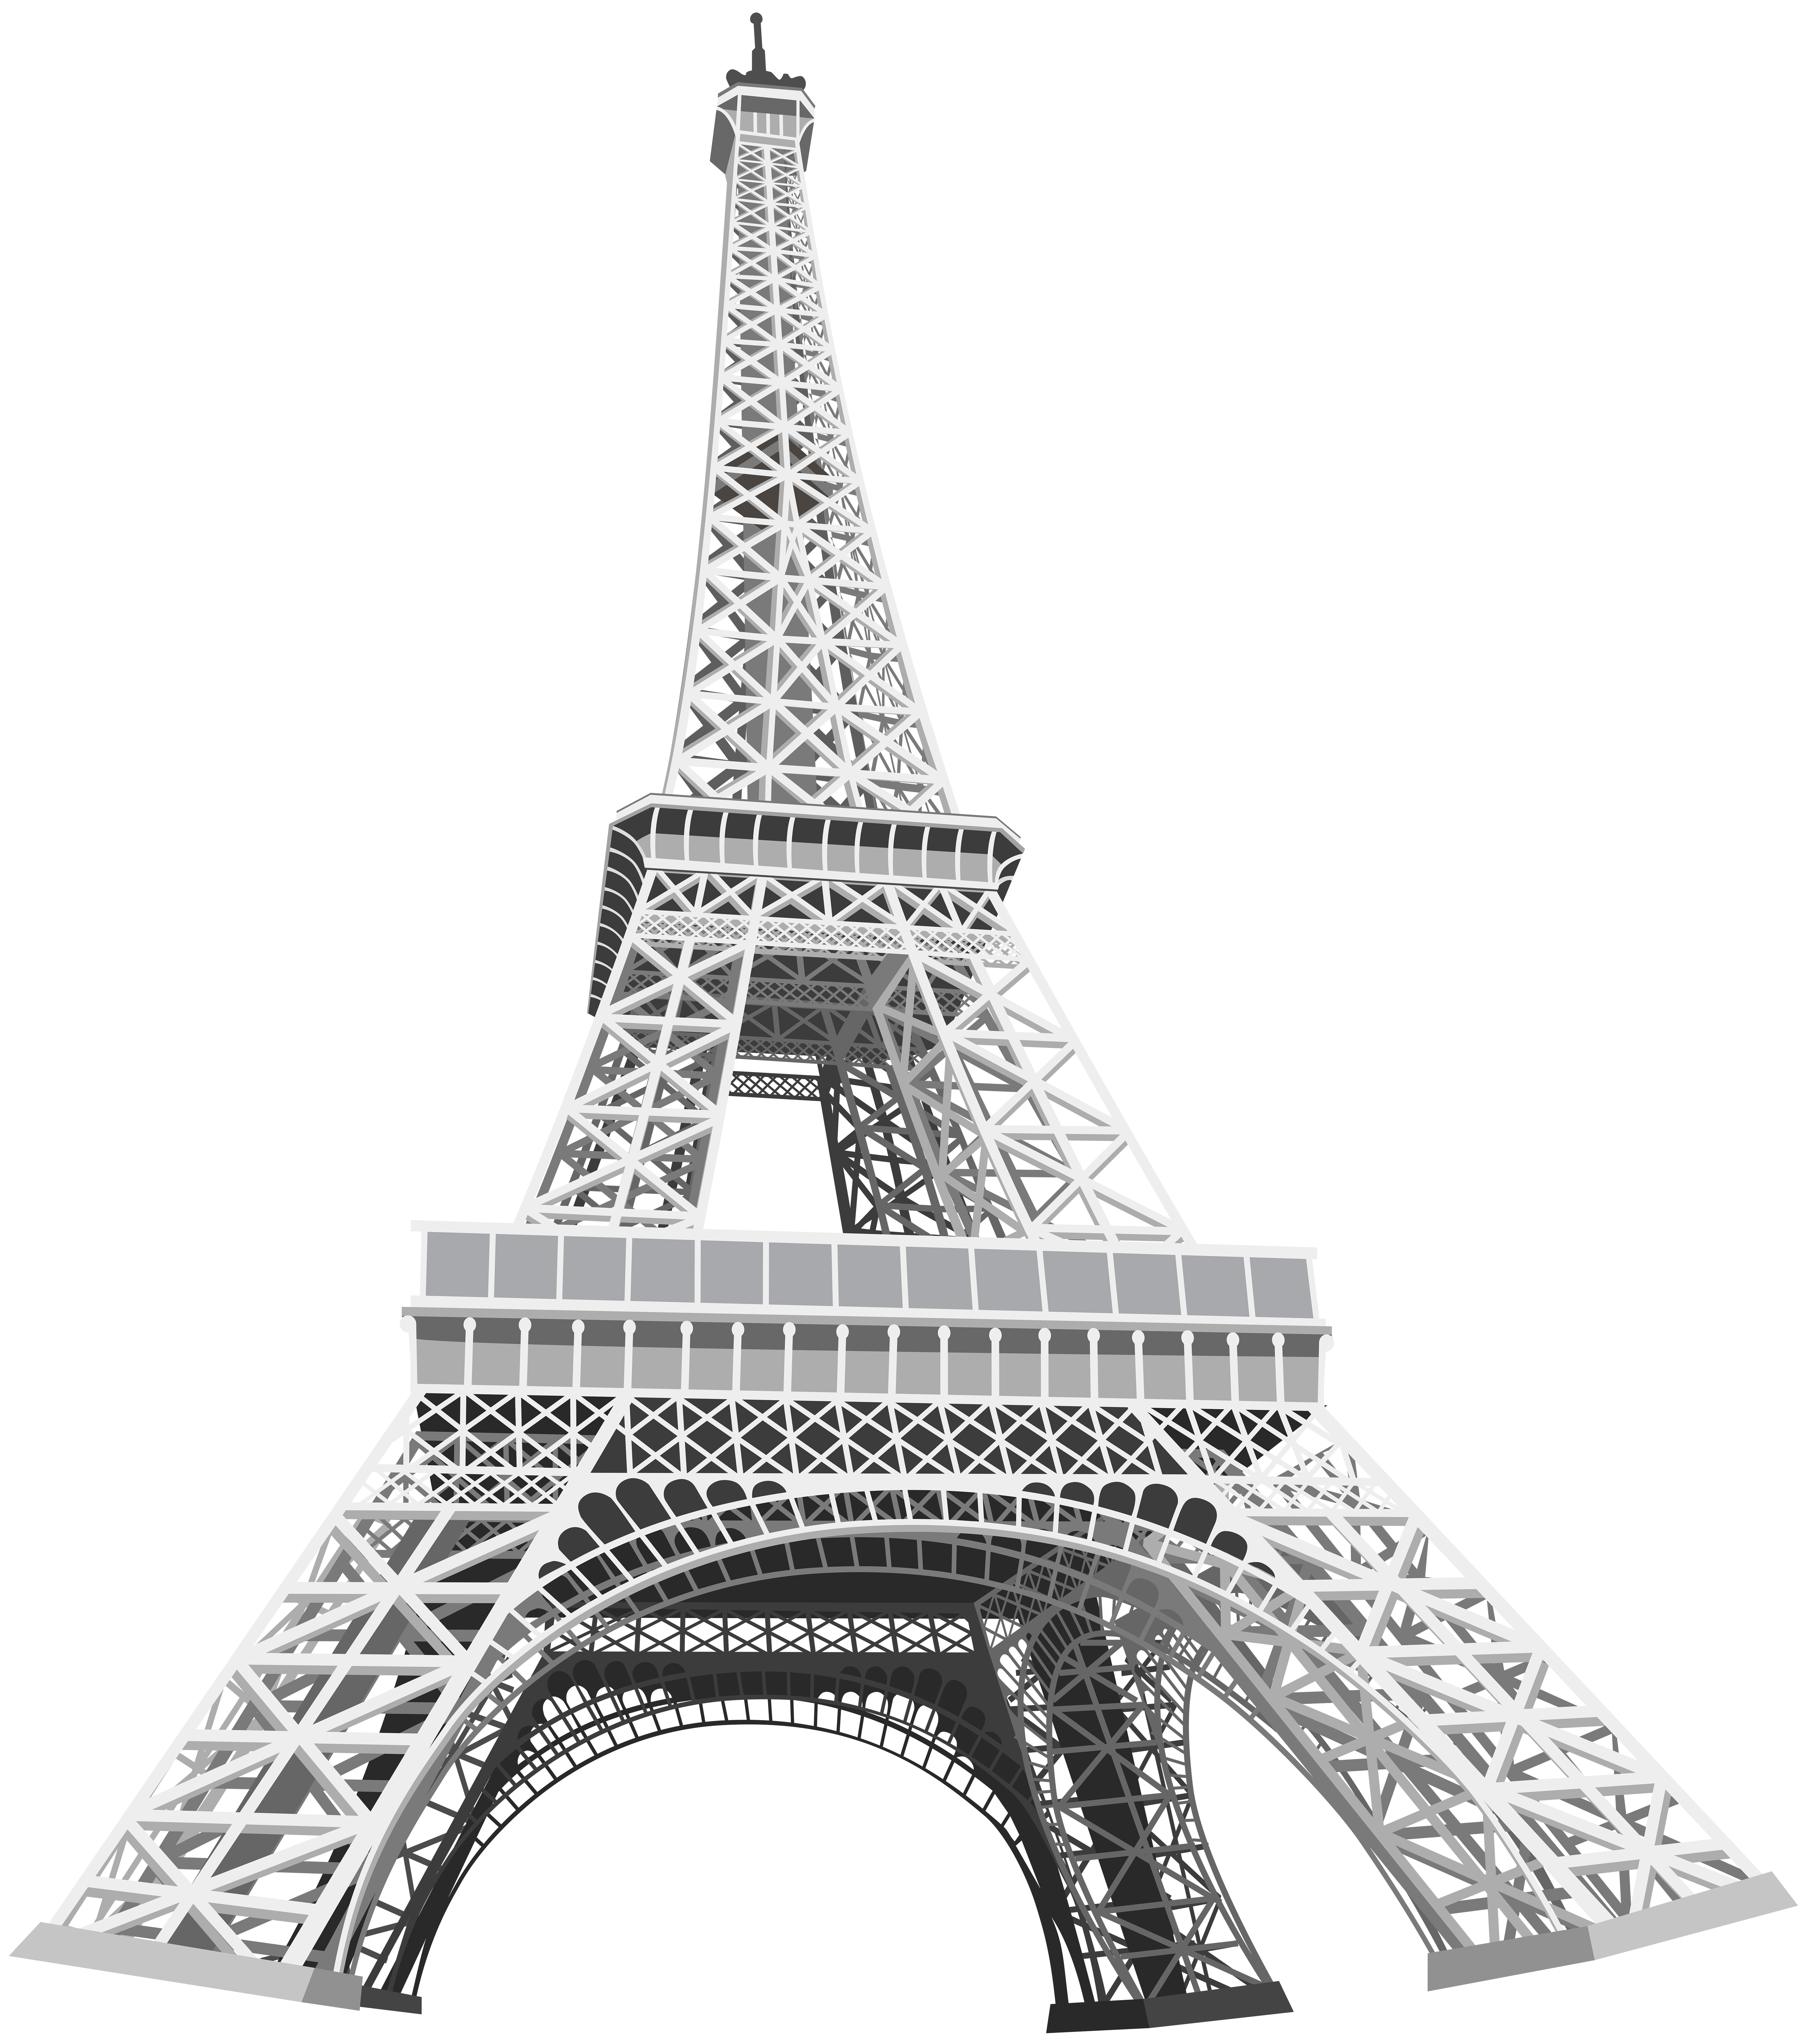 Eiffel tower heart clipart jpg transparent stock Eiffel Tower Transparent Clip Art Image | Gallery Yopriceville ... jpg transparent stock